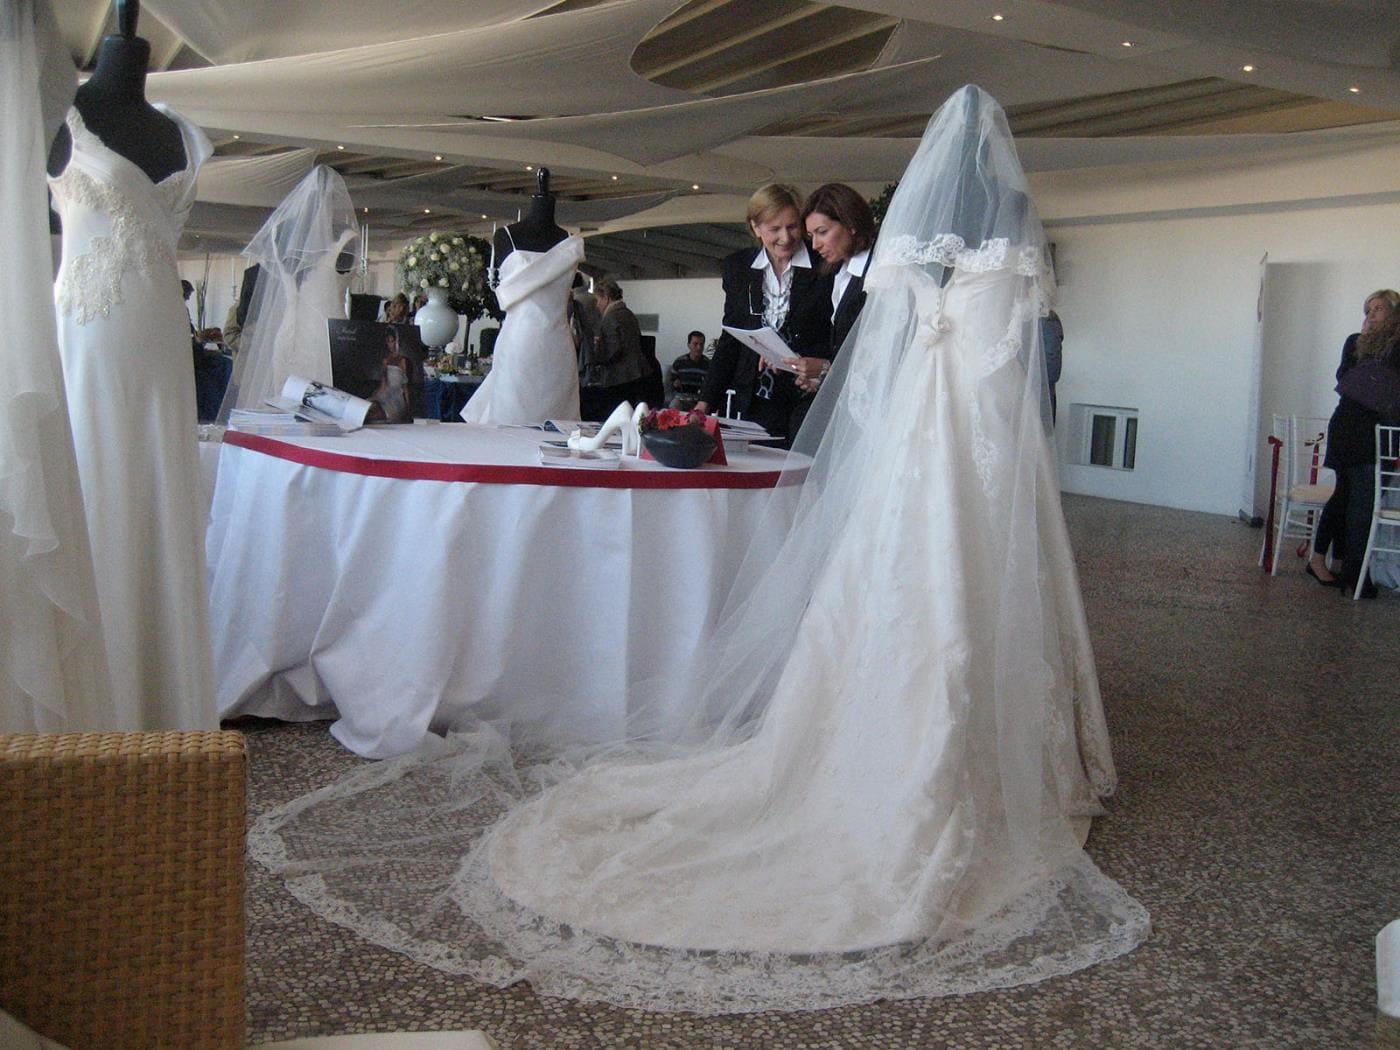 Maison - Marsil Alta Moda e Spose Roma